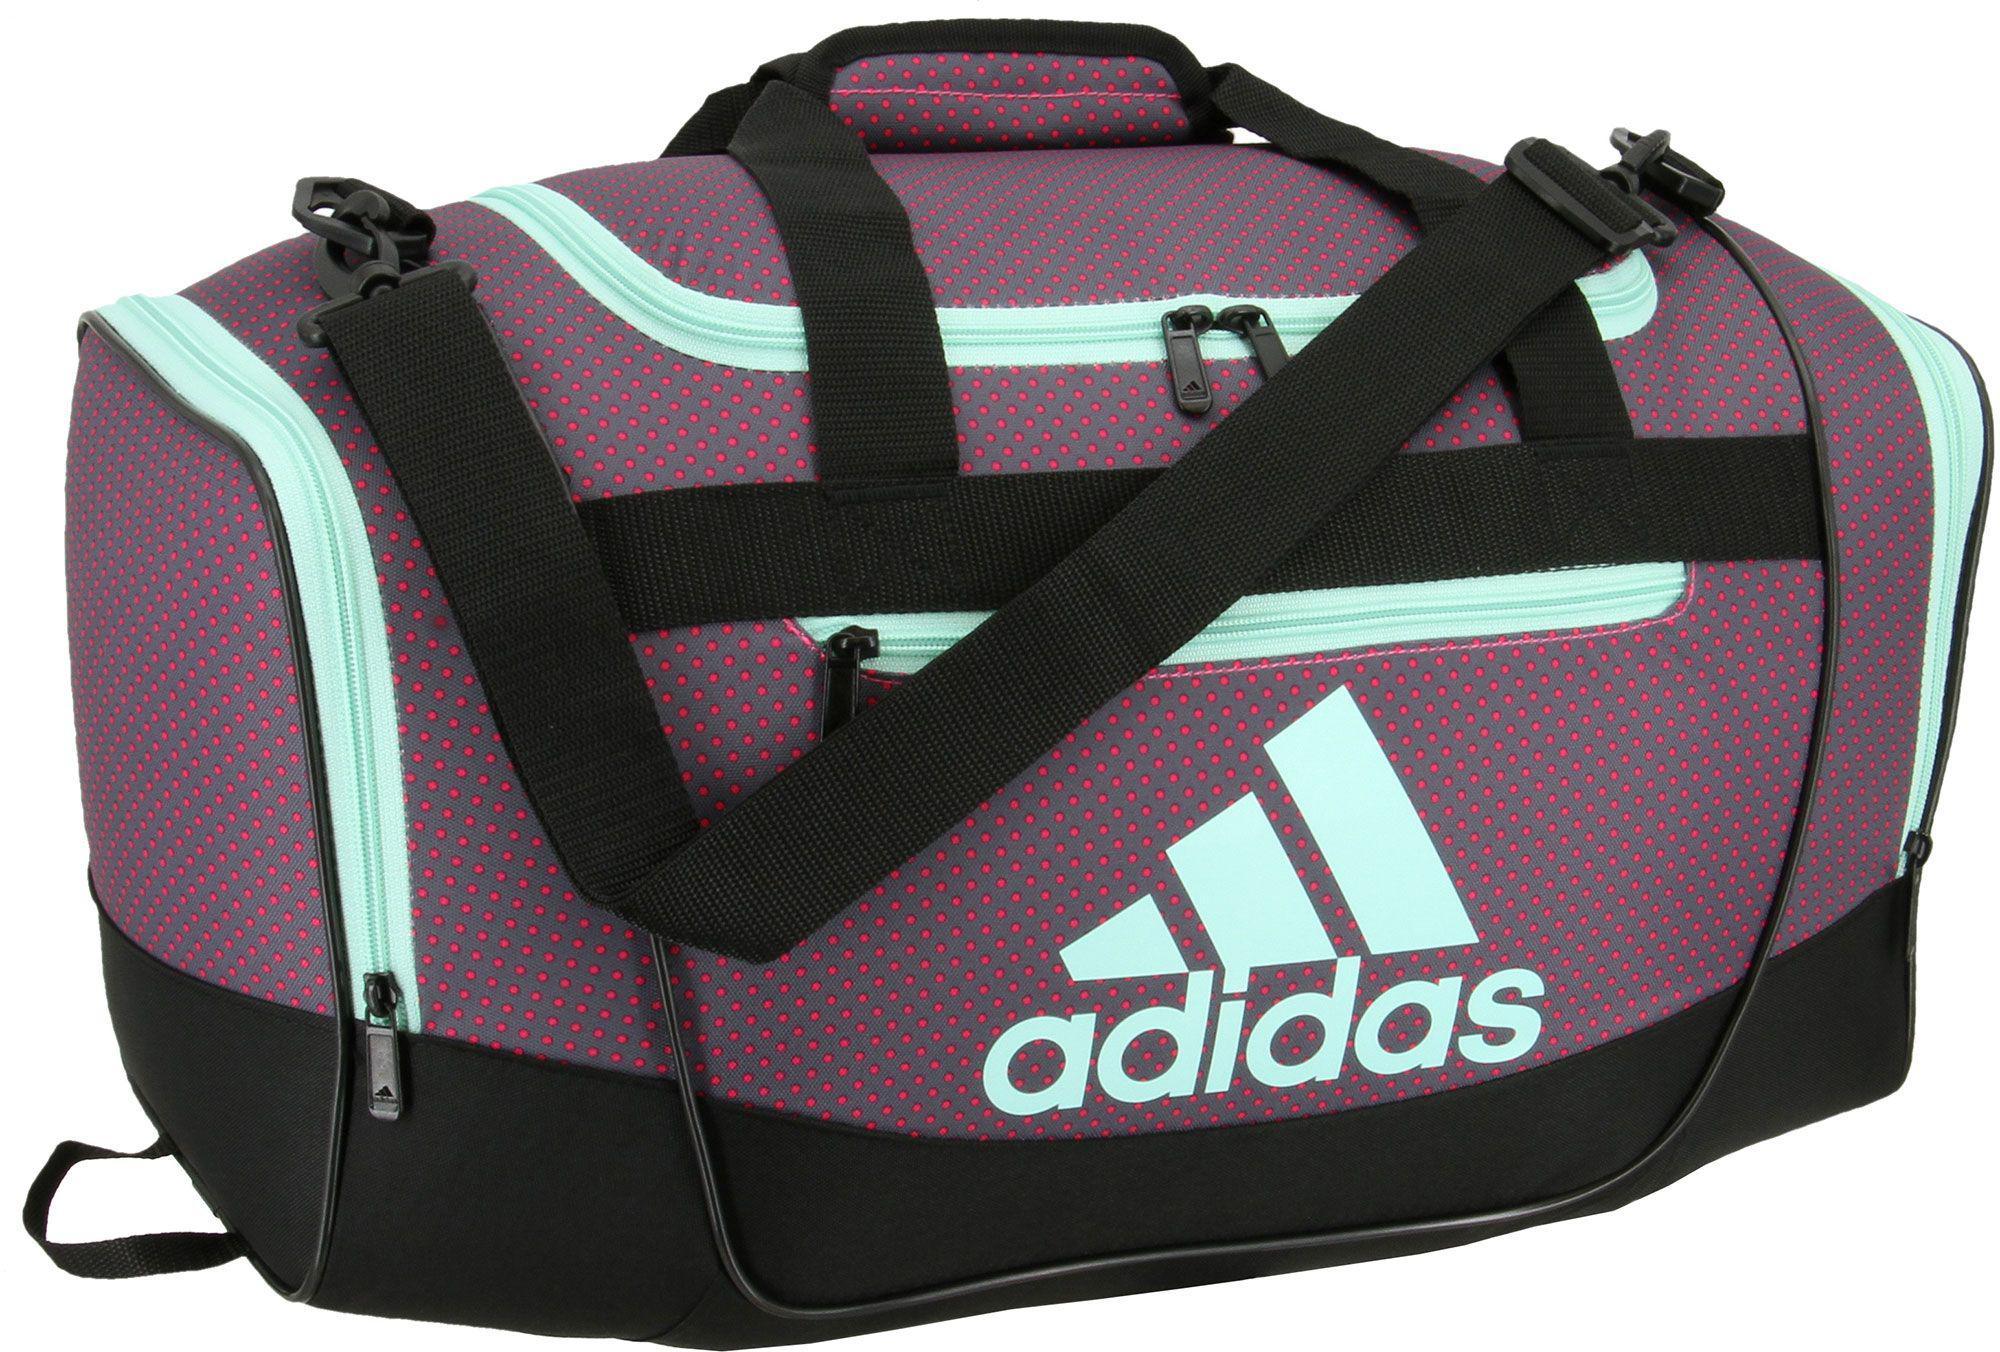 Lyst - adidas Defender Iii Small Duffle Bag for Men c783993d39f40